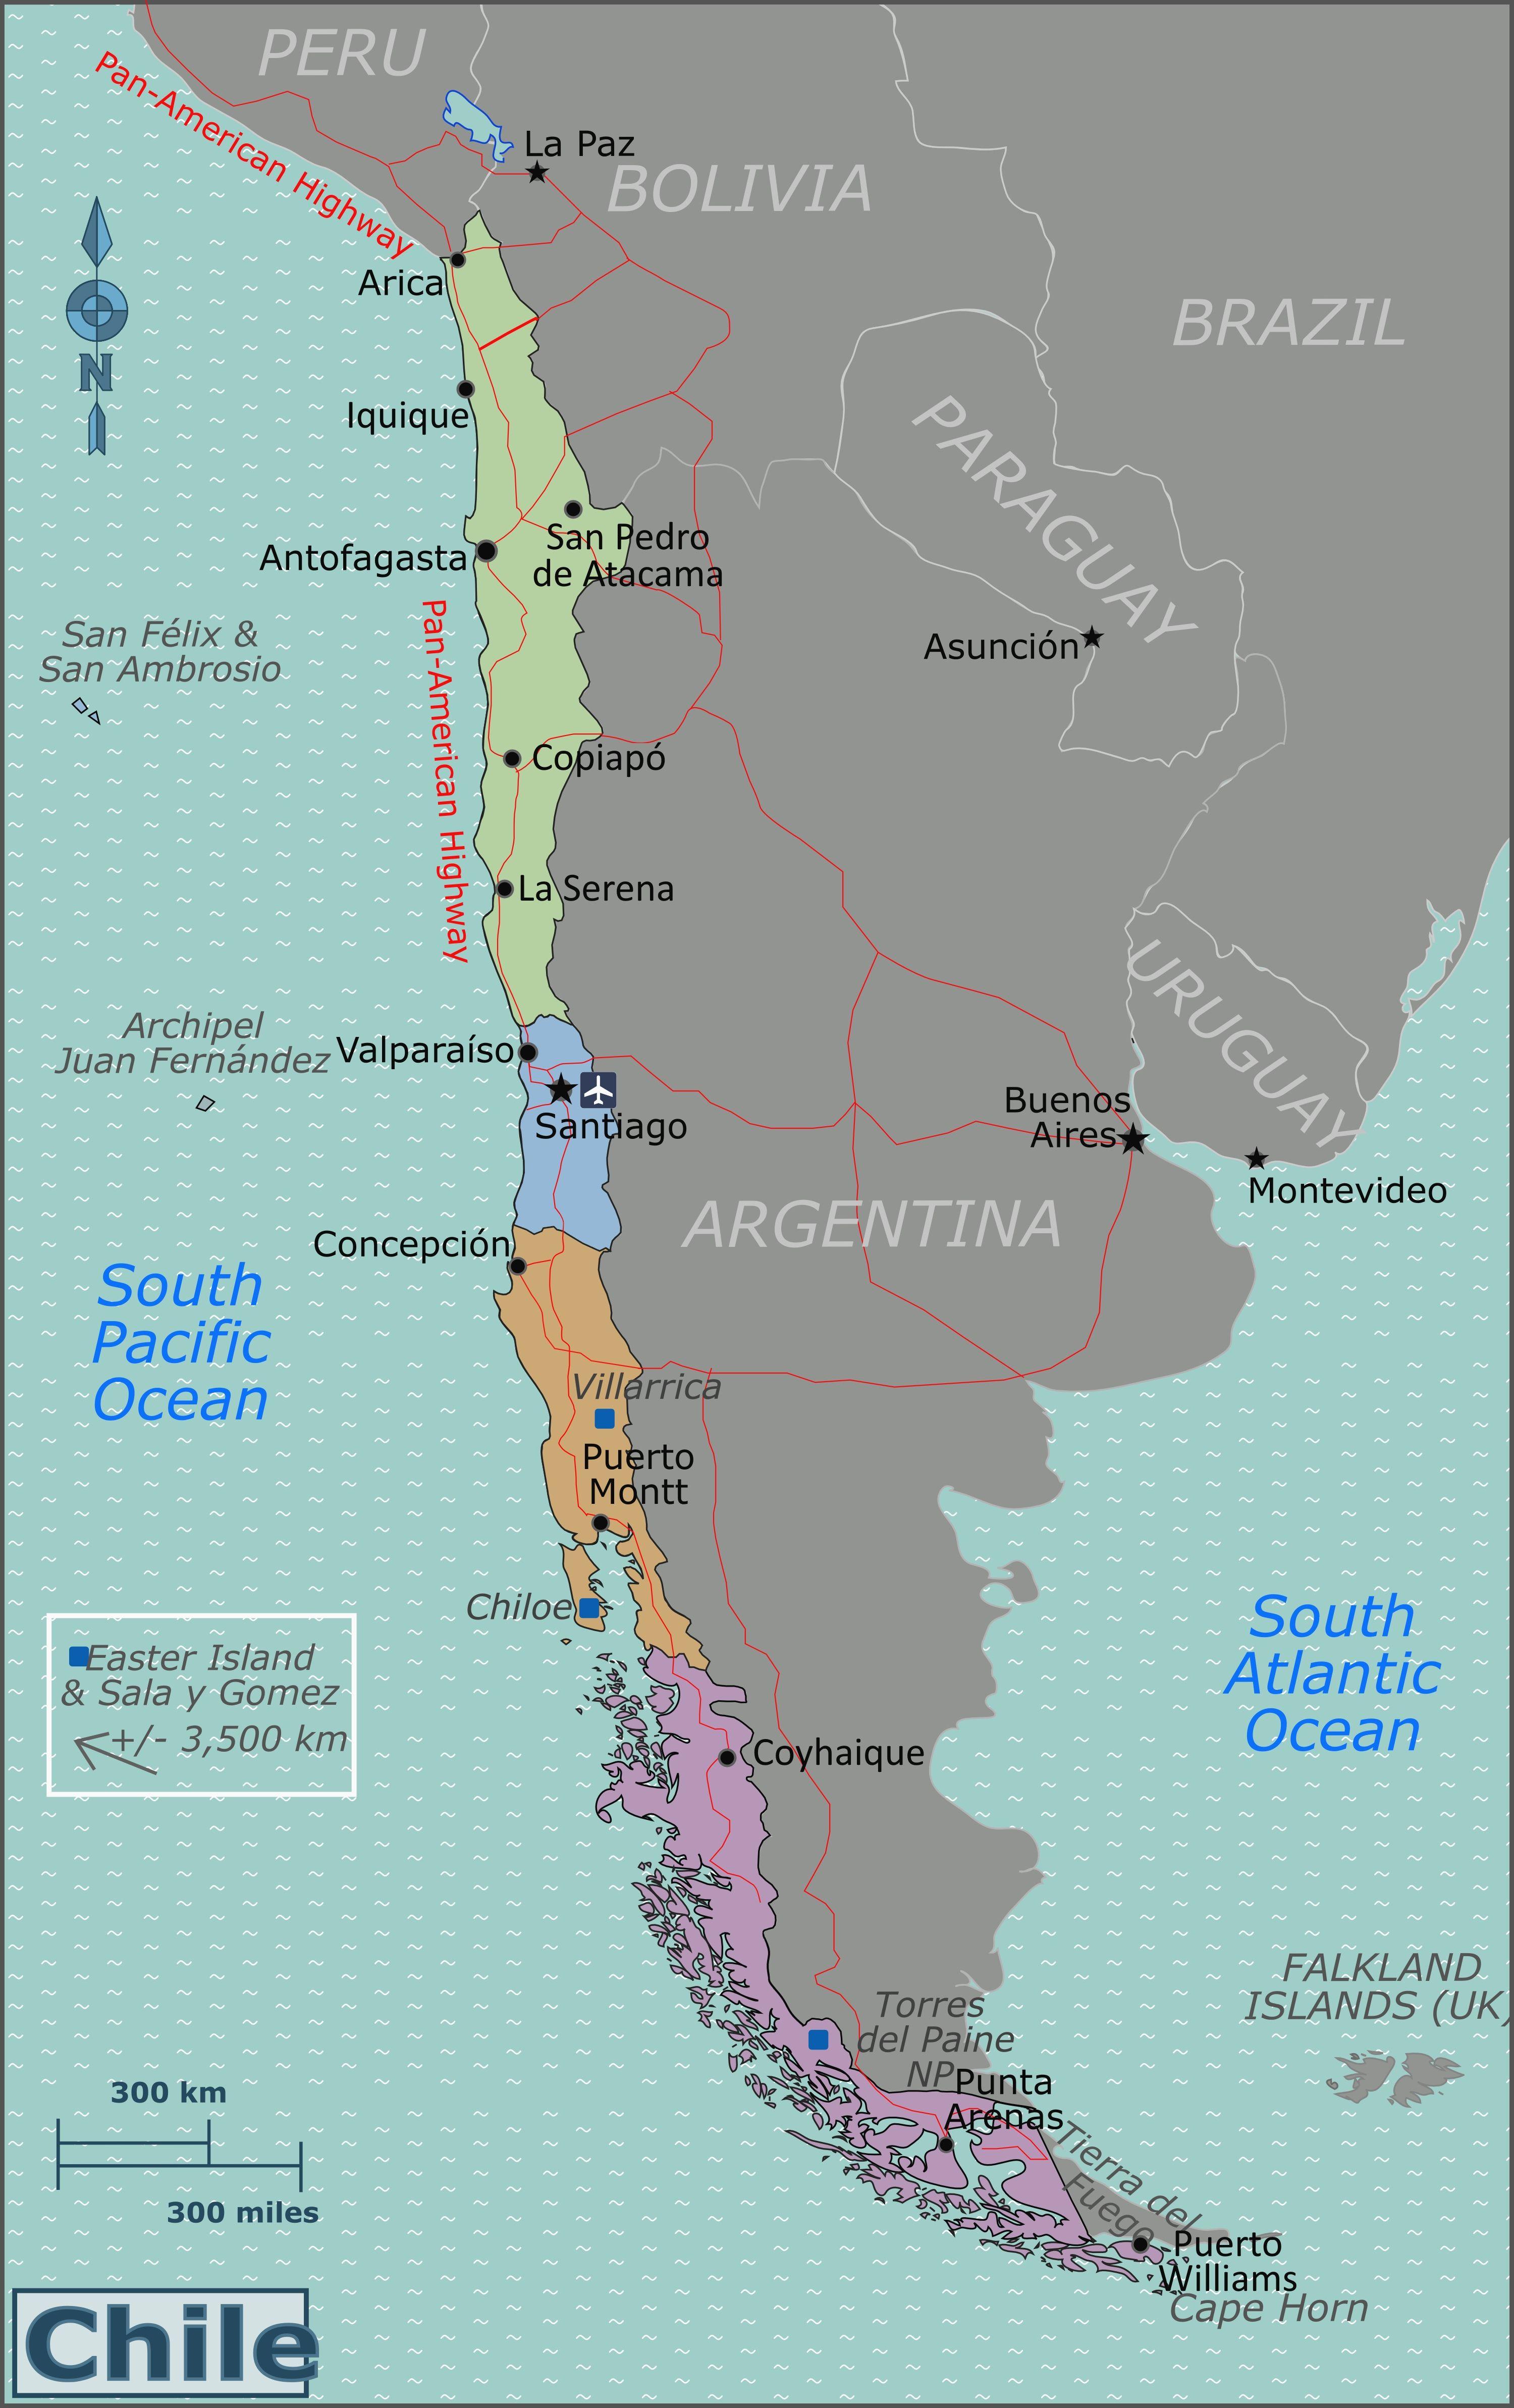 Lugares De Chile In Unserem Blog Viel Mehr Informationen Https Storelatina Com Chile Travelling Chyli չիլիում ચ Chile Travel Chile South America Travel